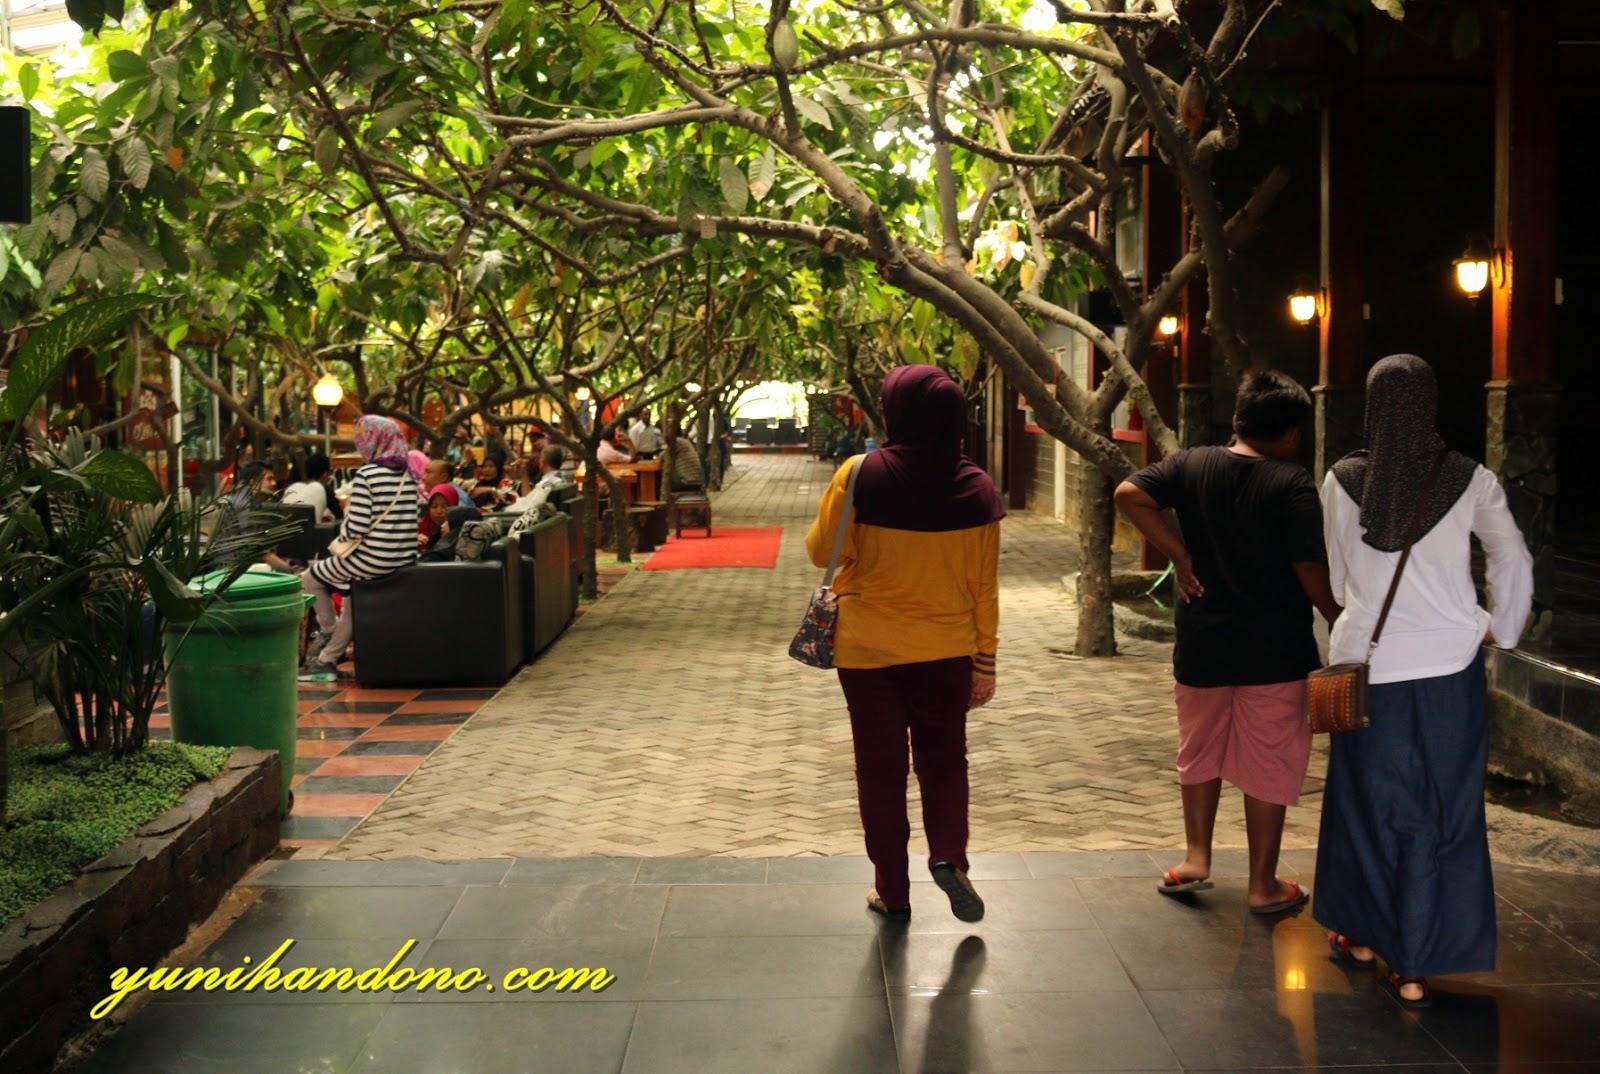 Kampung Coklat Sebuah Wahana Rekreasi Mengedukasi Barangkali Kehadiran Blitar Mendongkrak